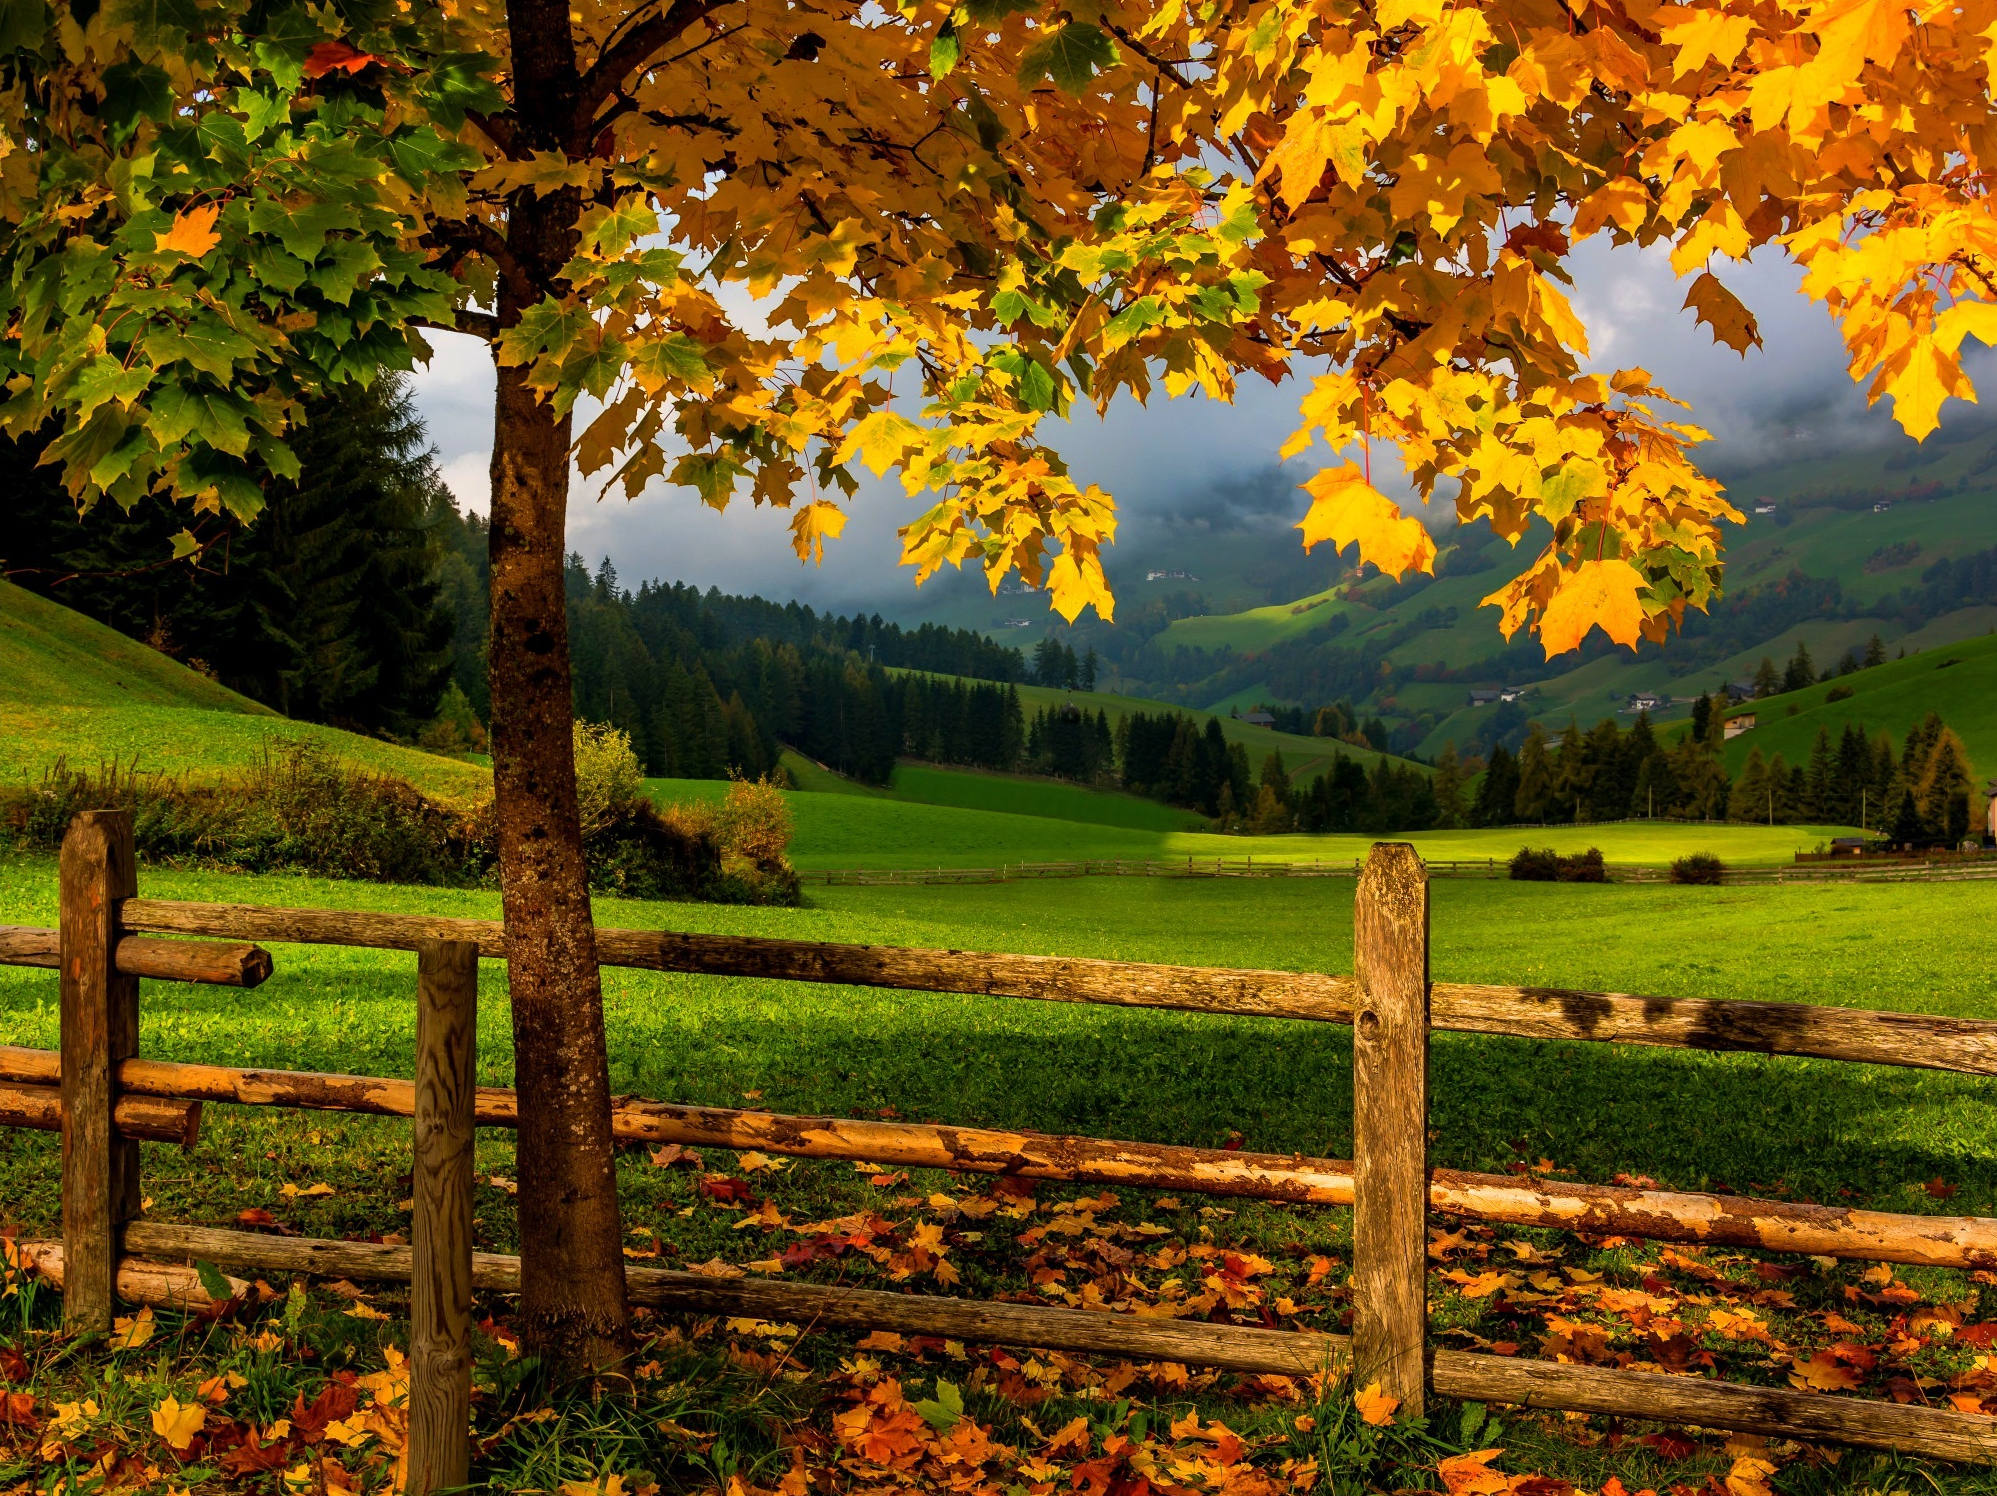 Autumn Landscape HD Wallpaper | Background Image ...